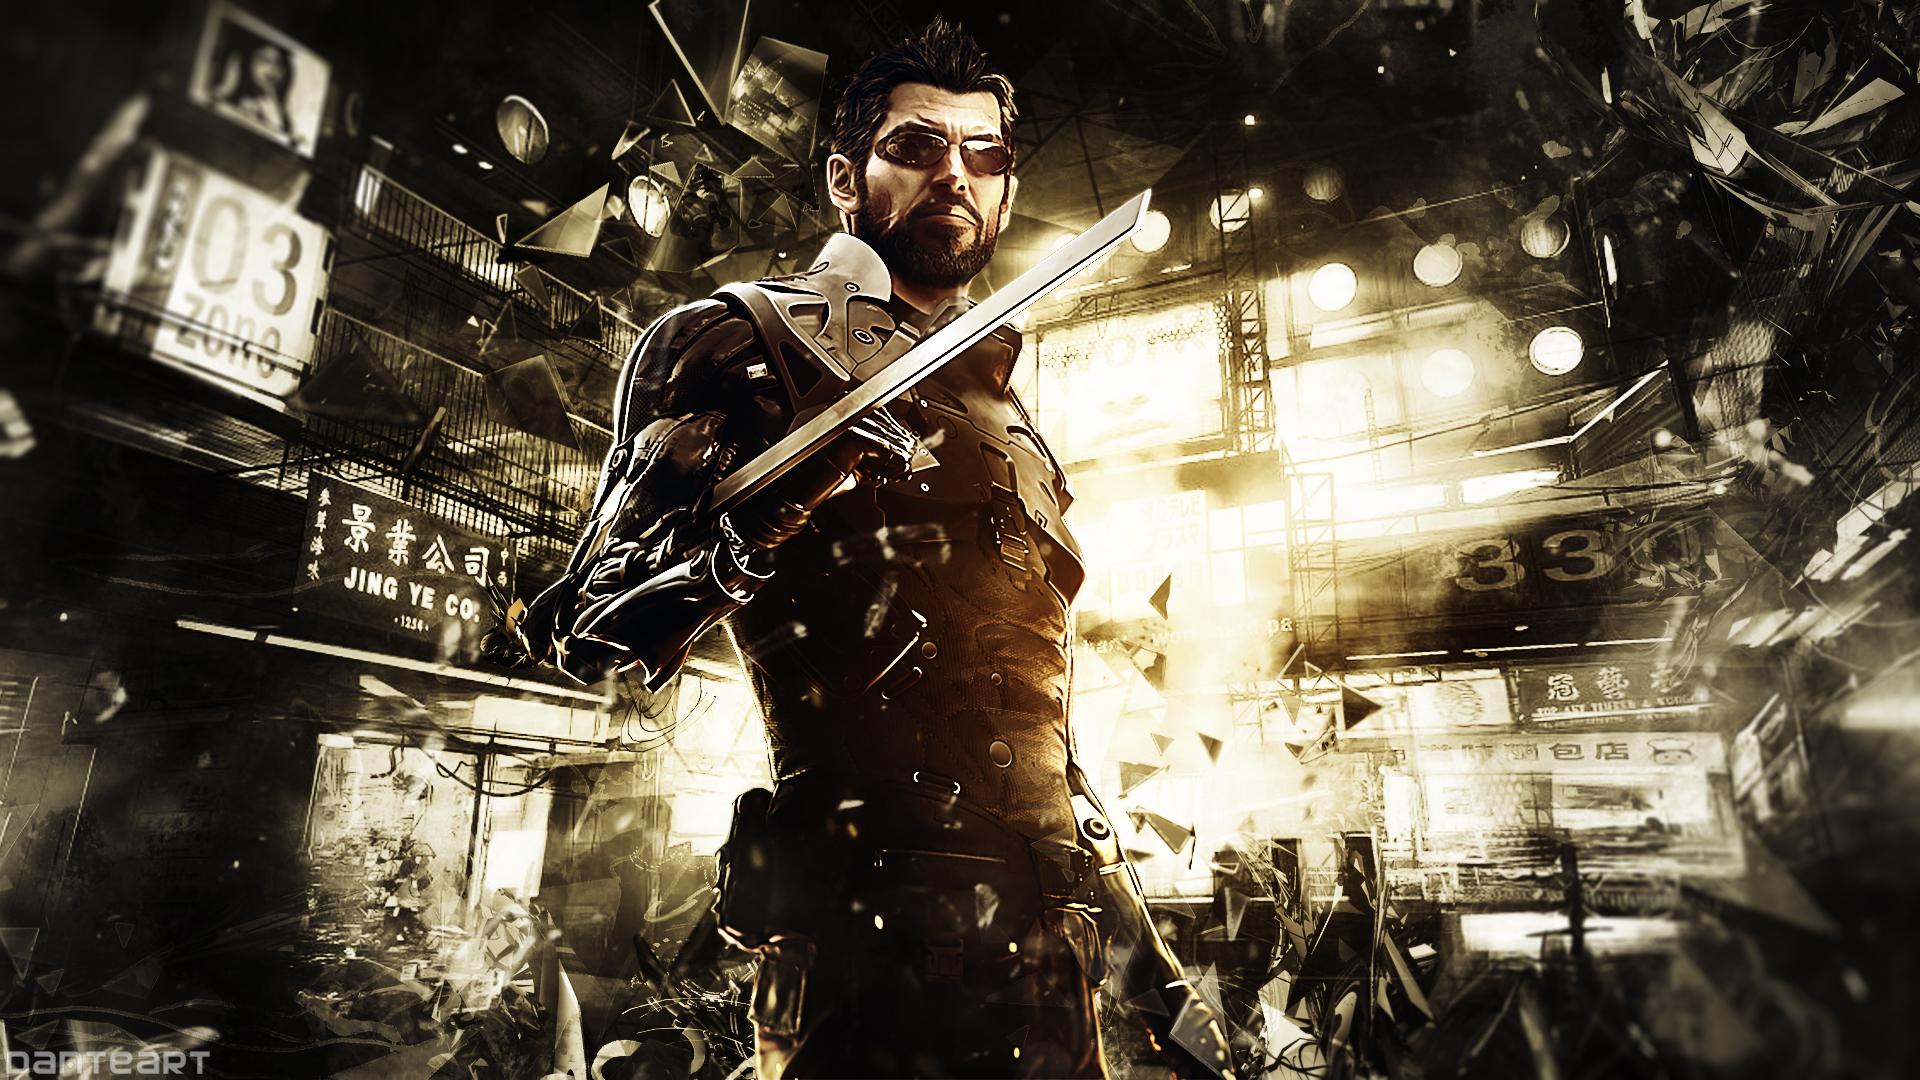 Amazing Deus Ex Mankind Divided Wallpaper